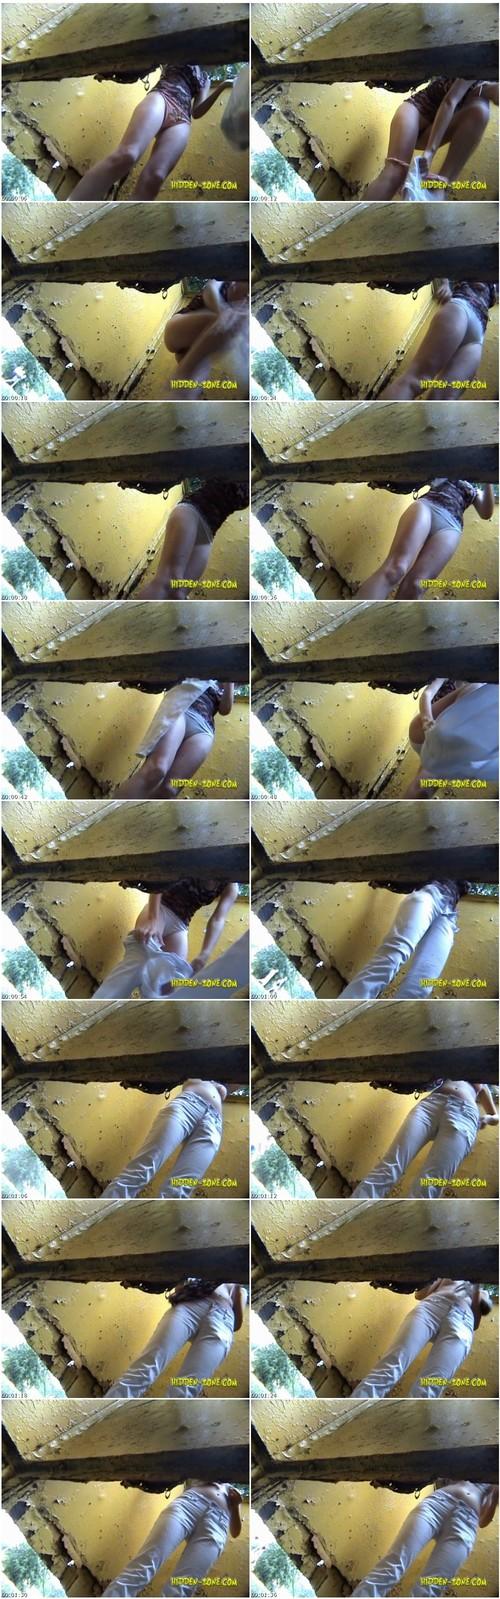 http://ist5-1.filesor.com/pimpandhost.com/9/6/8/3/96838/6/i/t/i/6itiY/Hidden-zoneBeach355_thumb_m.jpg